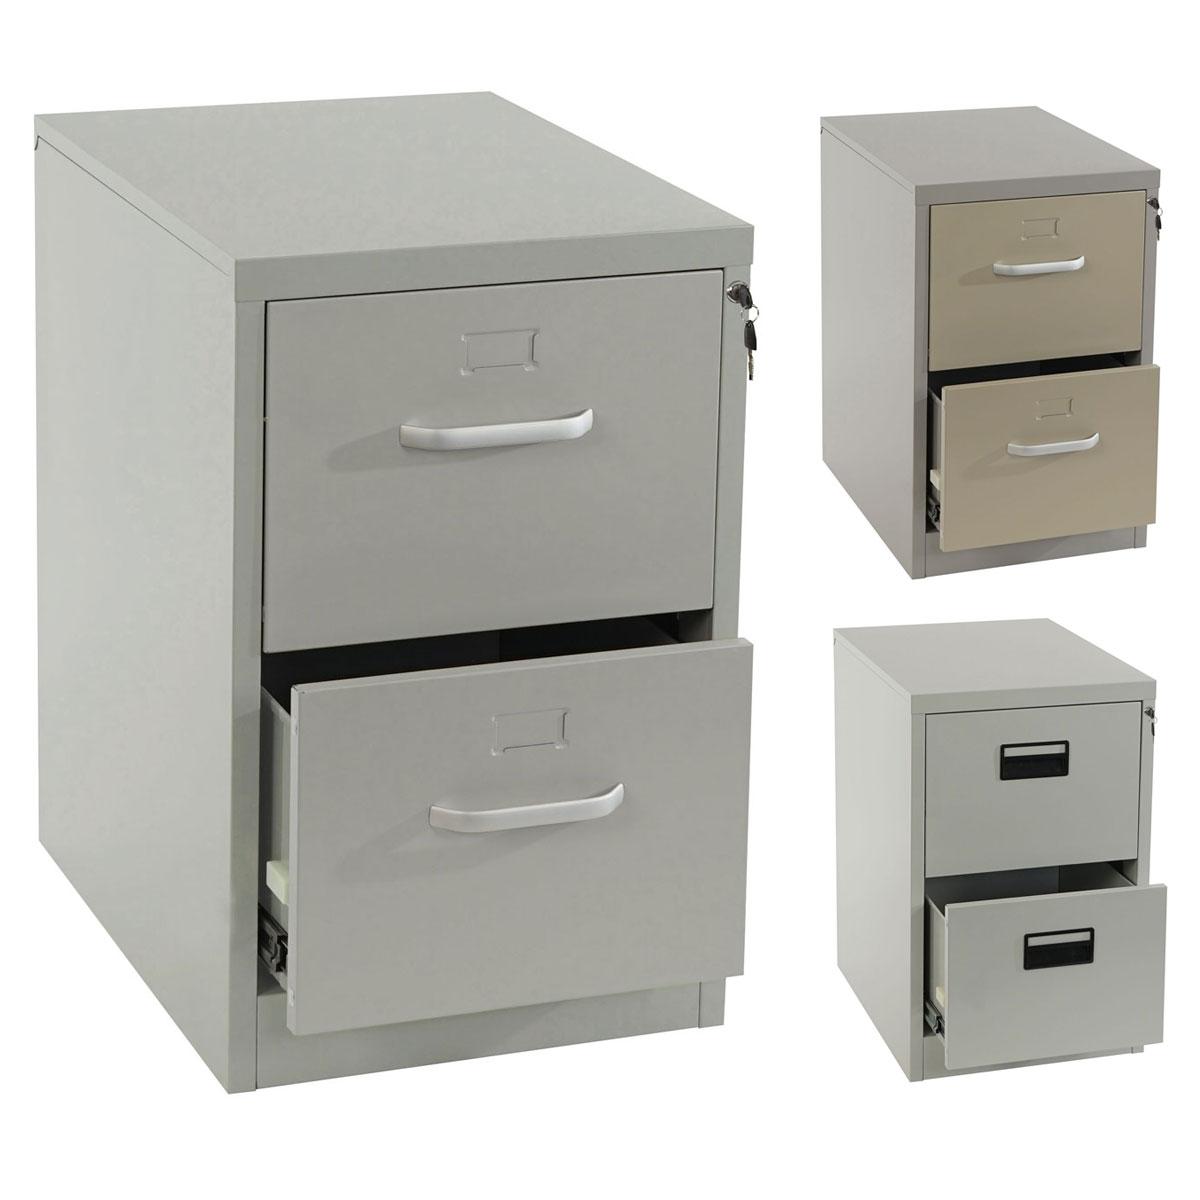 h ngeregisterschrank boston aktenschrank b roschrank 73x46x62cm grau beige ebay. Black Bedroom Furniture Sets. Home Design Ideas